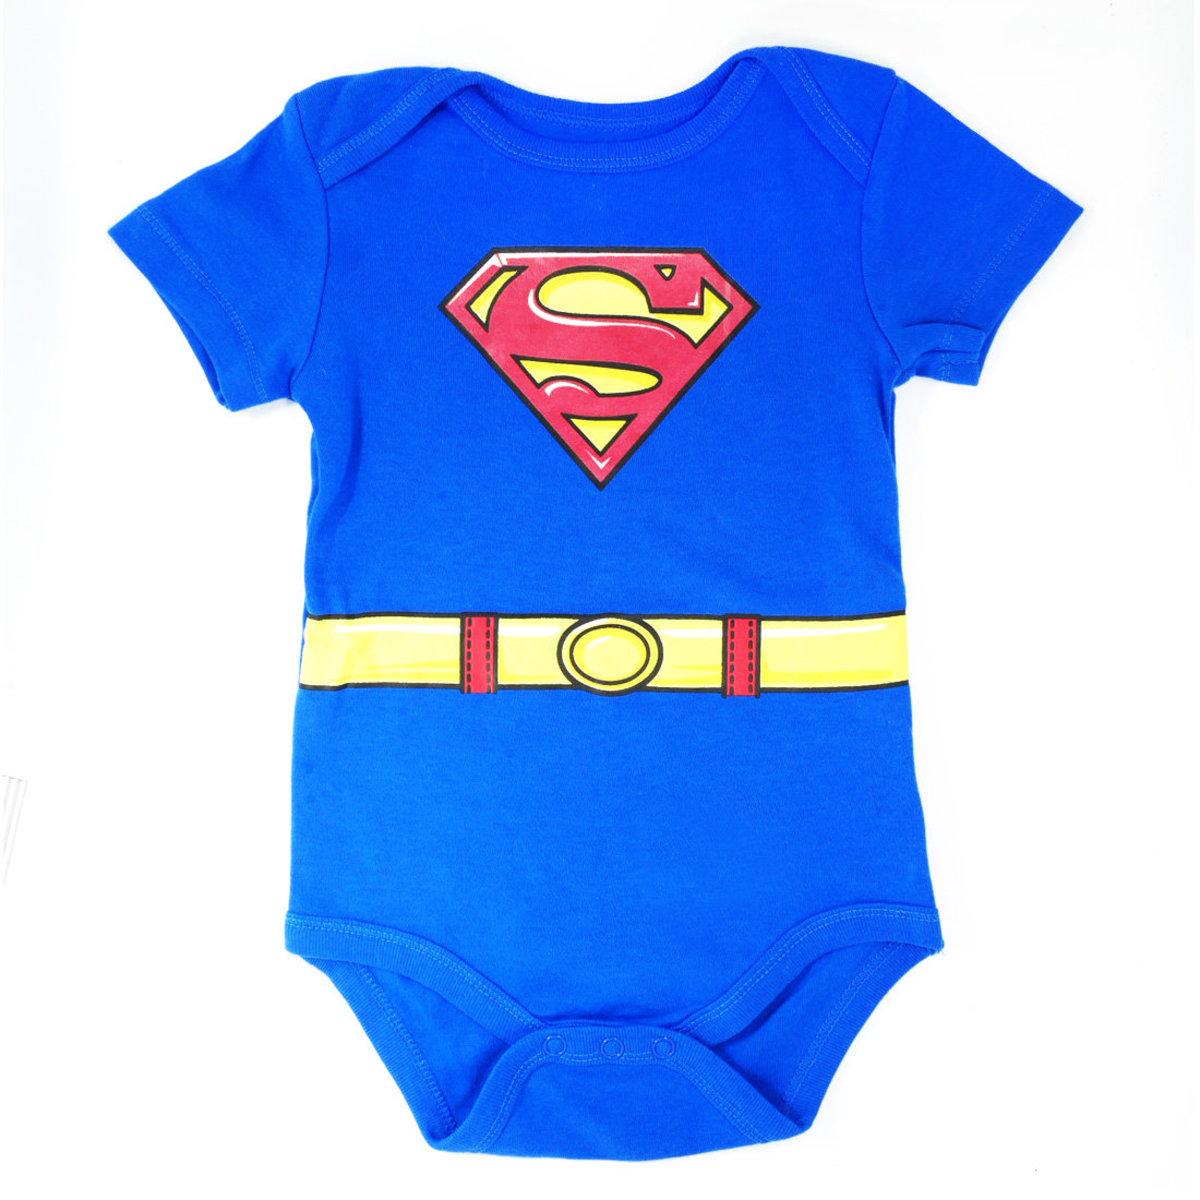 Superman Baby Bodysuit 6-18 months (parallel)